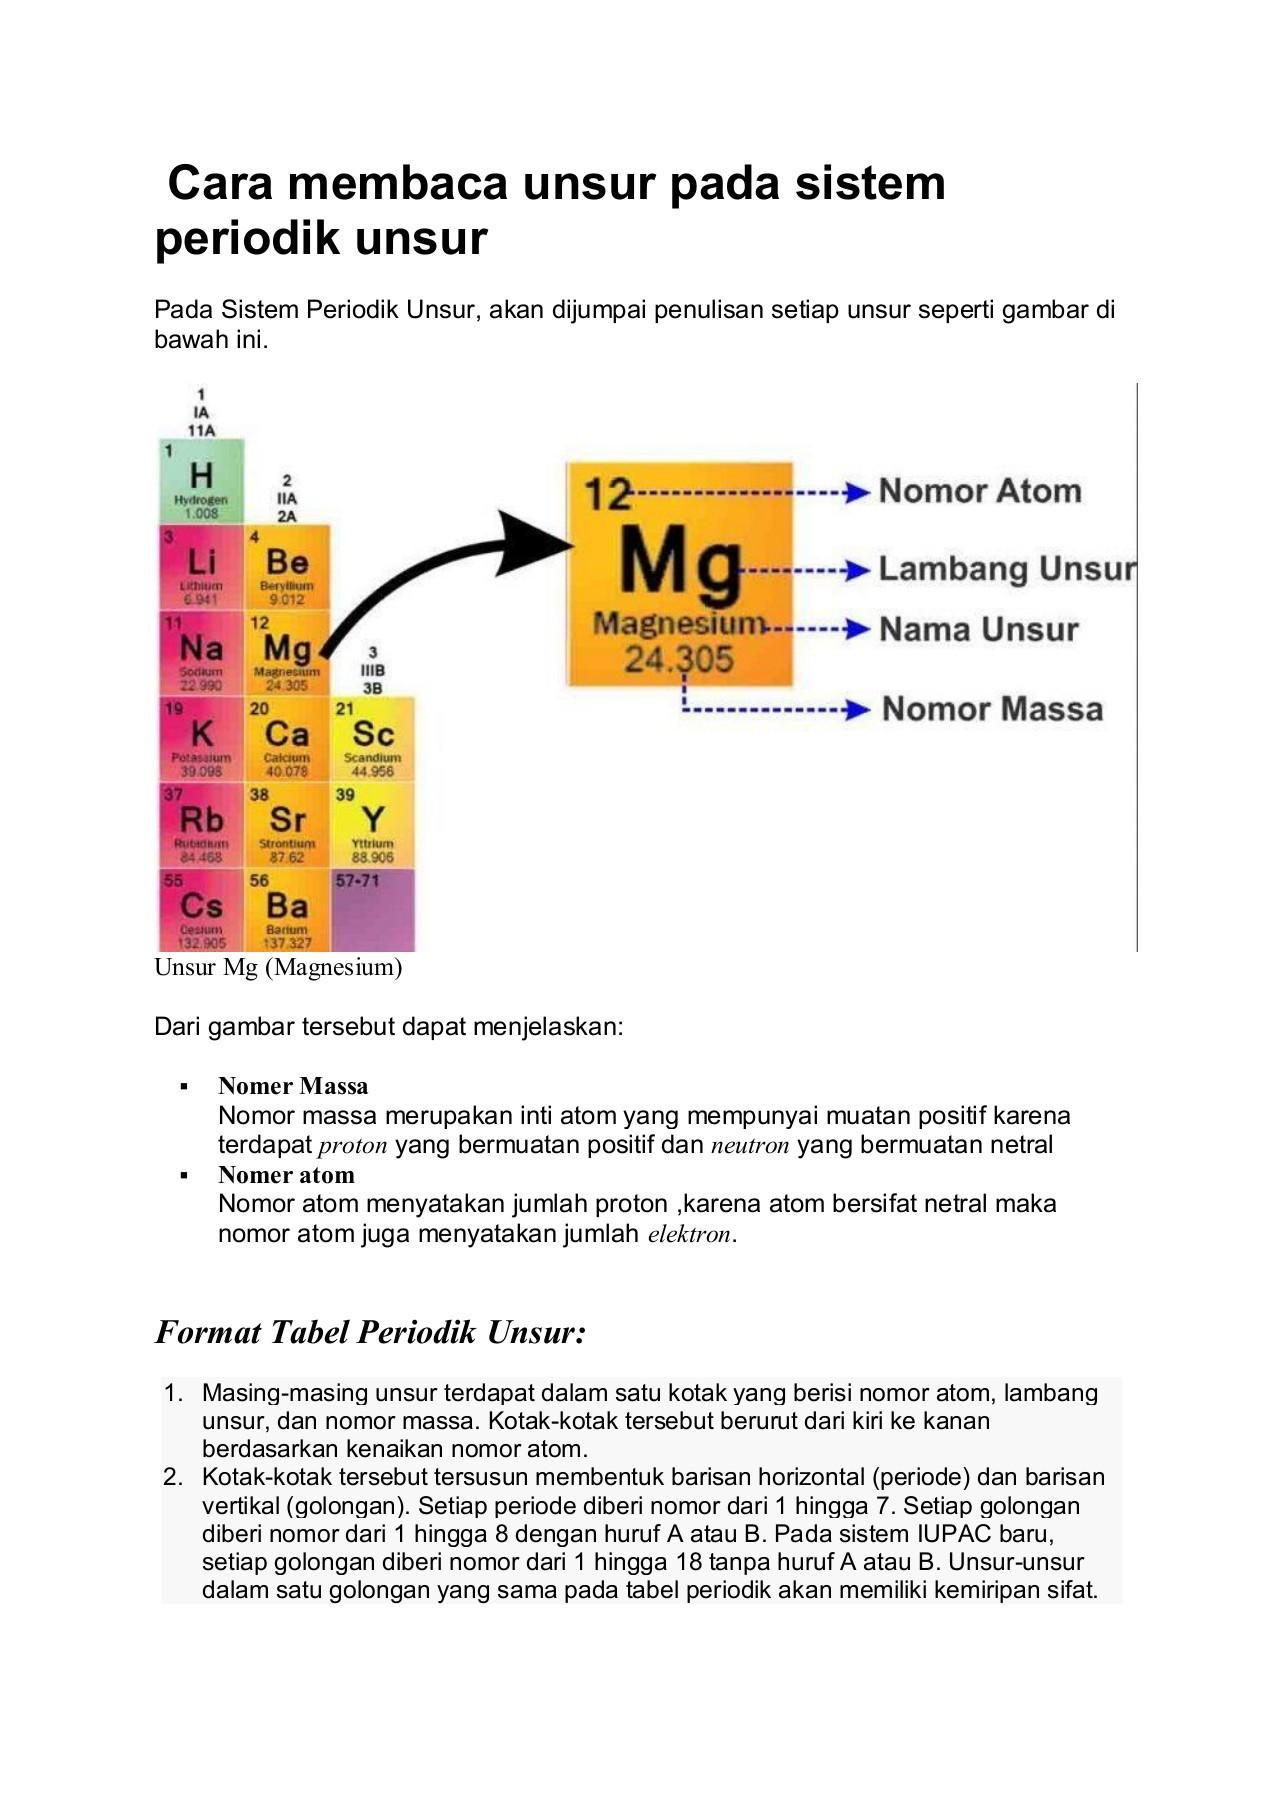 Sistem Periodik Unsur Pdf : sistem, periodik, unsur, SISTEM, PERIODIK, UNSUR, Natani, Online, PubHTML5